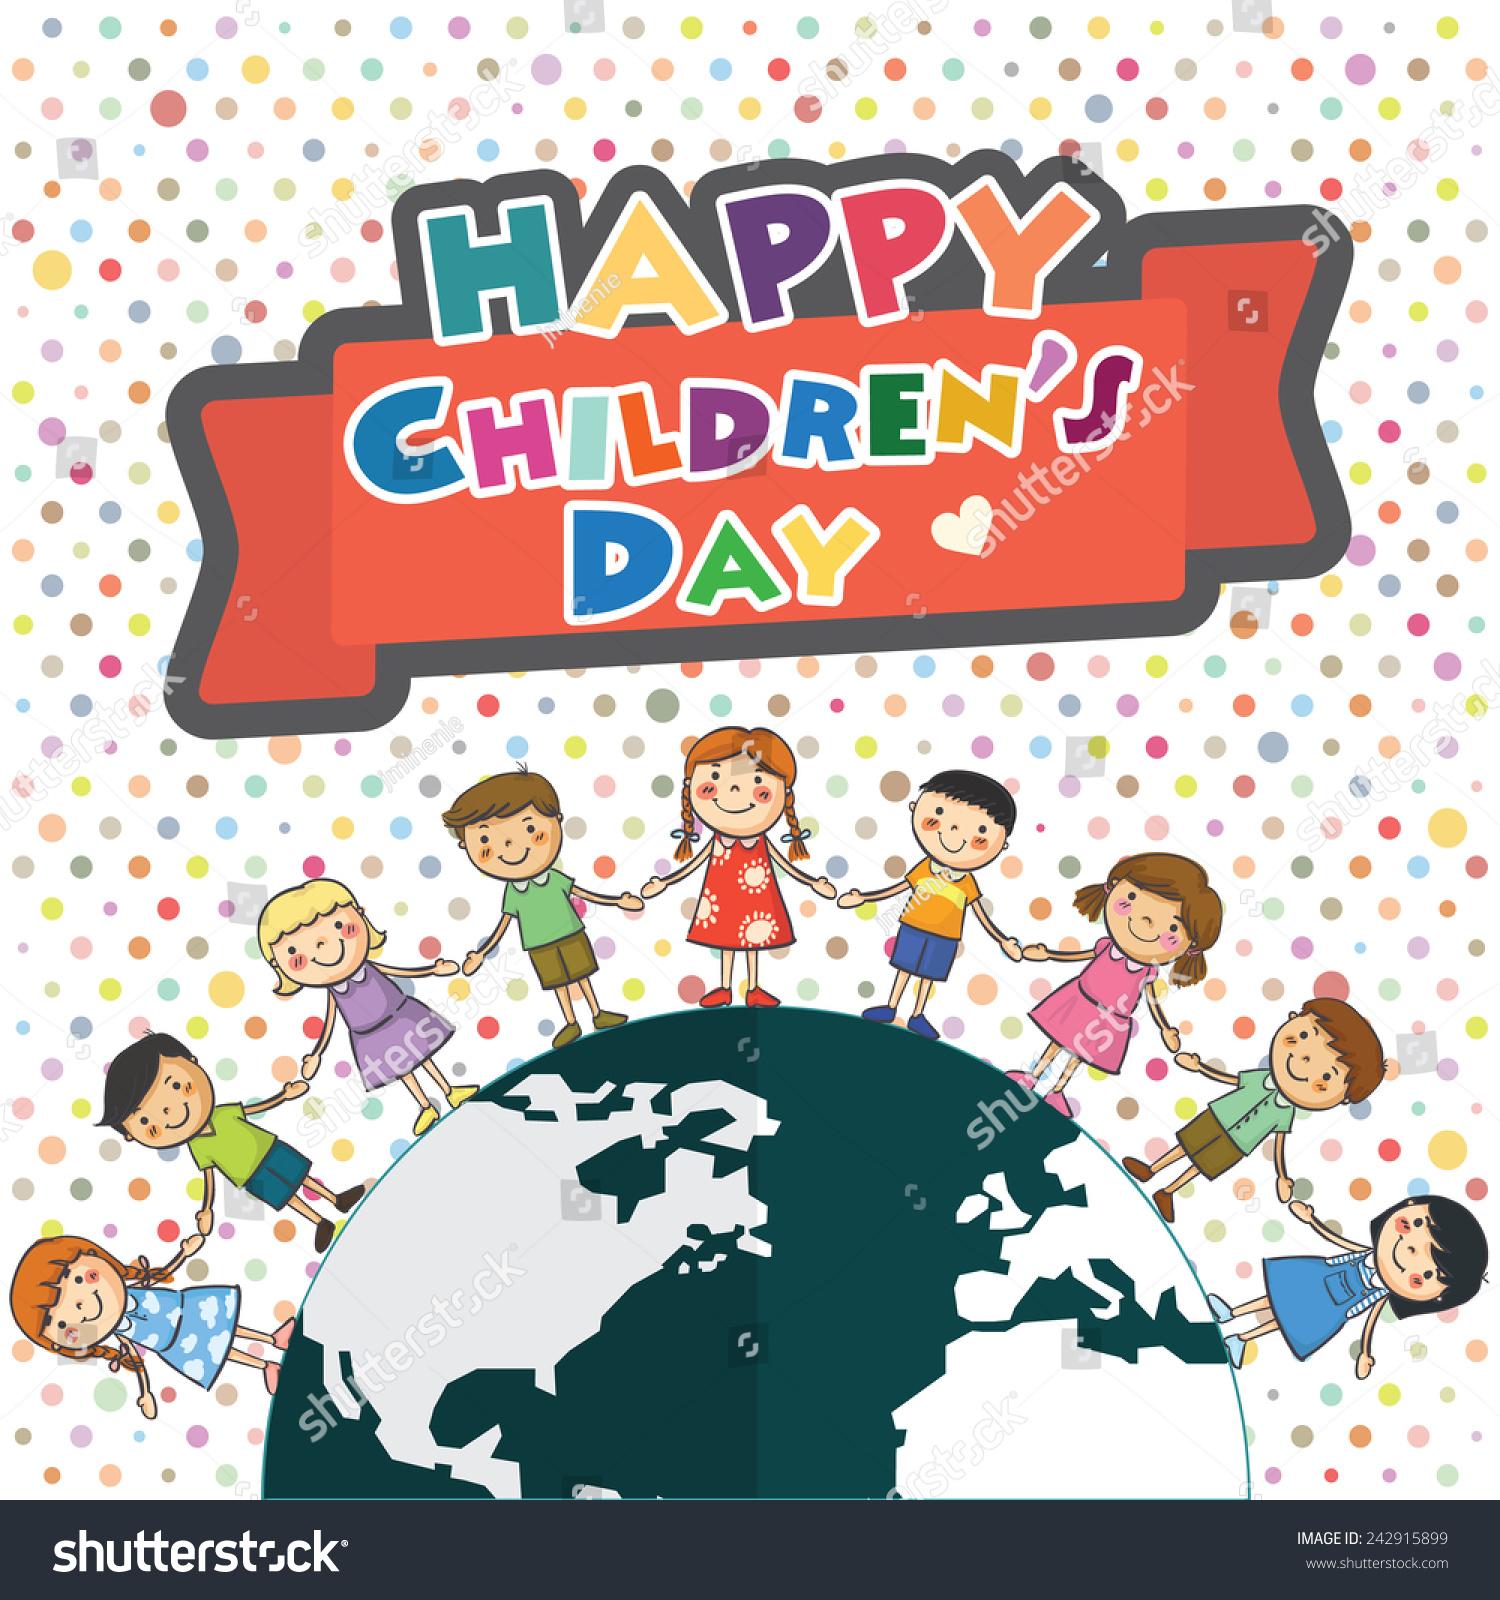 Happy Childrens Day Stock Vector 242915899 - Shutterstock